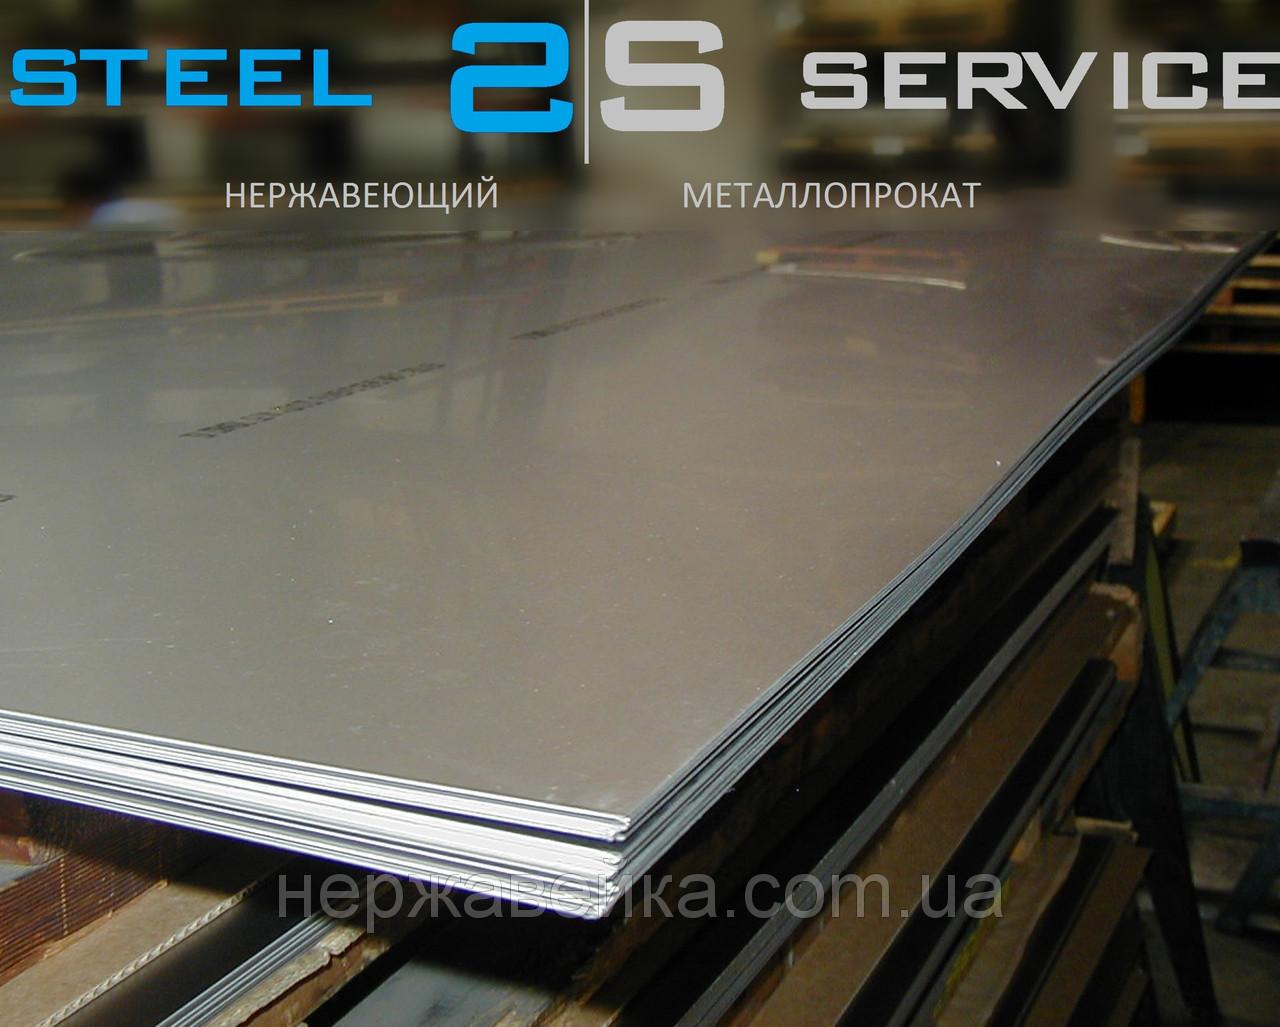 Нержавейка лист 3х1000х2000мм AISI 430(12Х17) 2B - матовый, технический